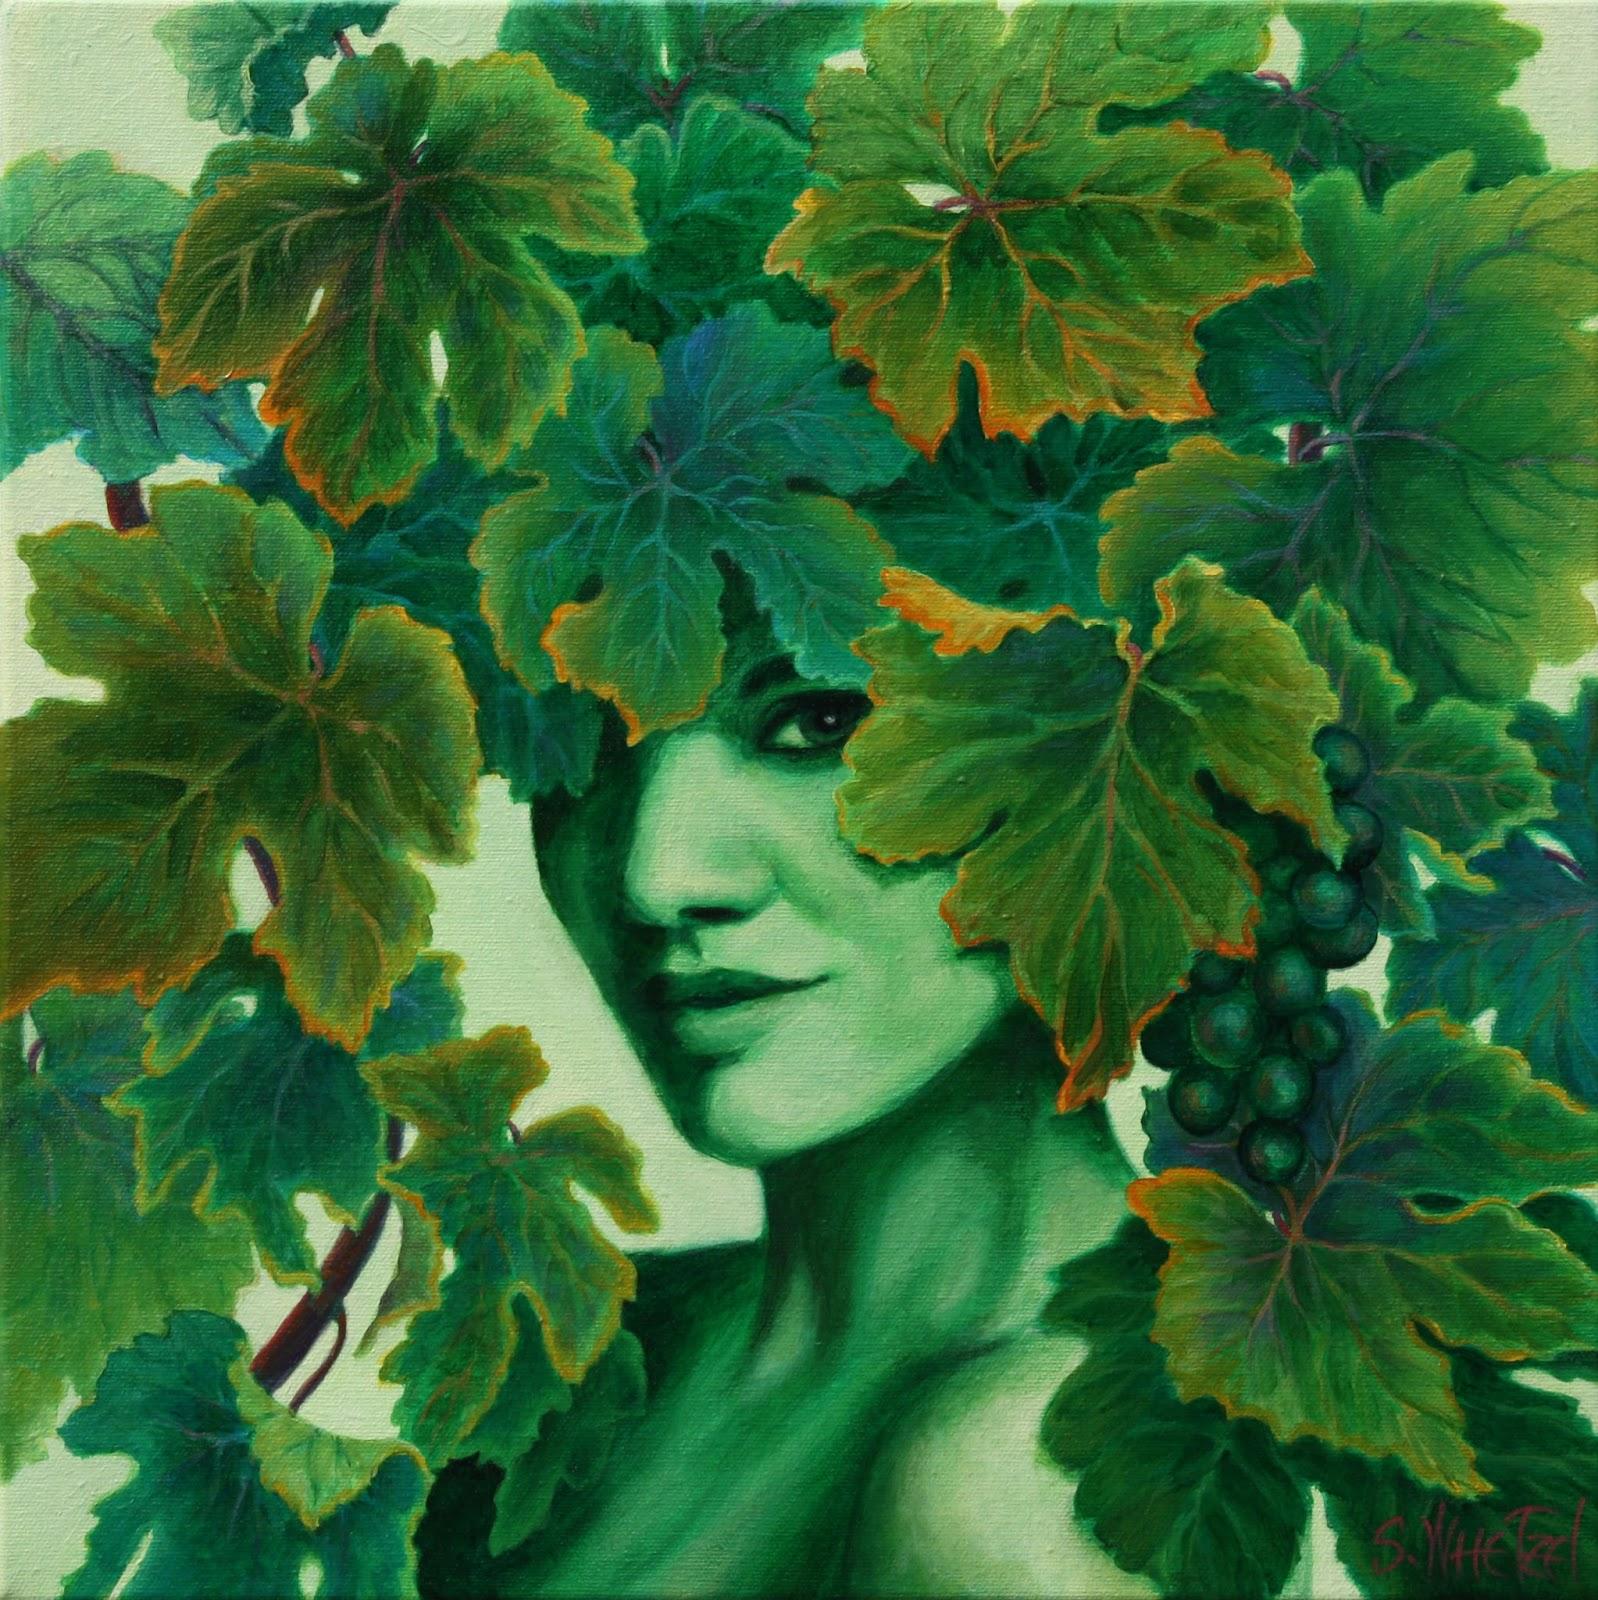 Leaves Paintings And Drawings Acrylic Grape Leaves Paintings